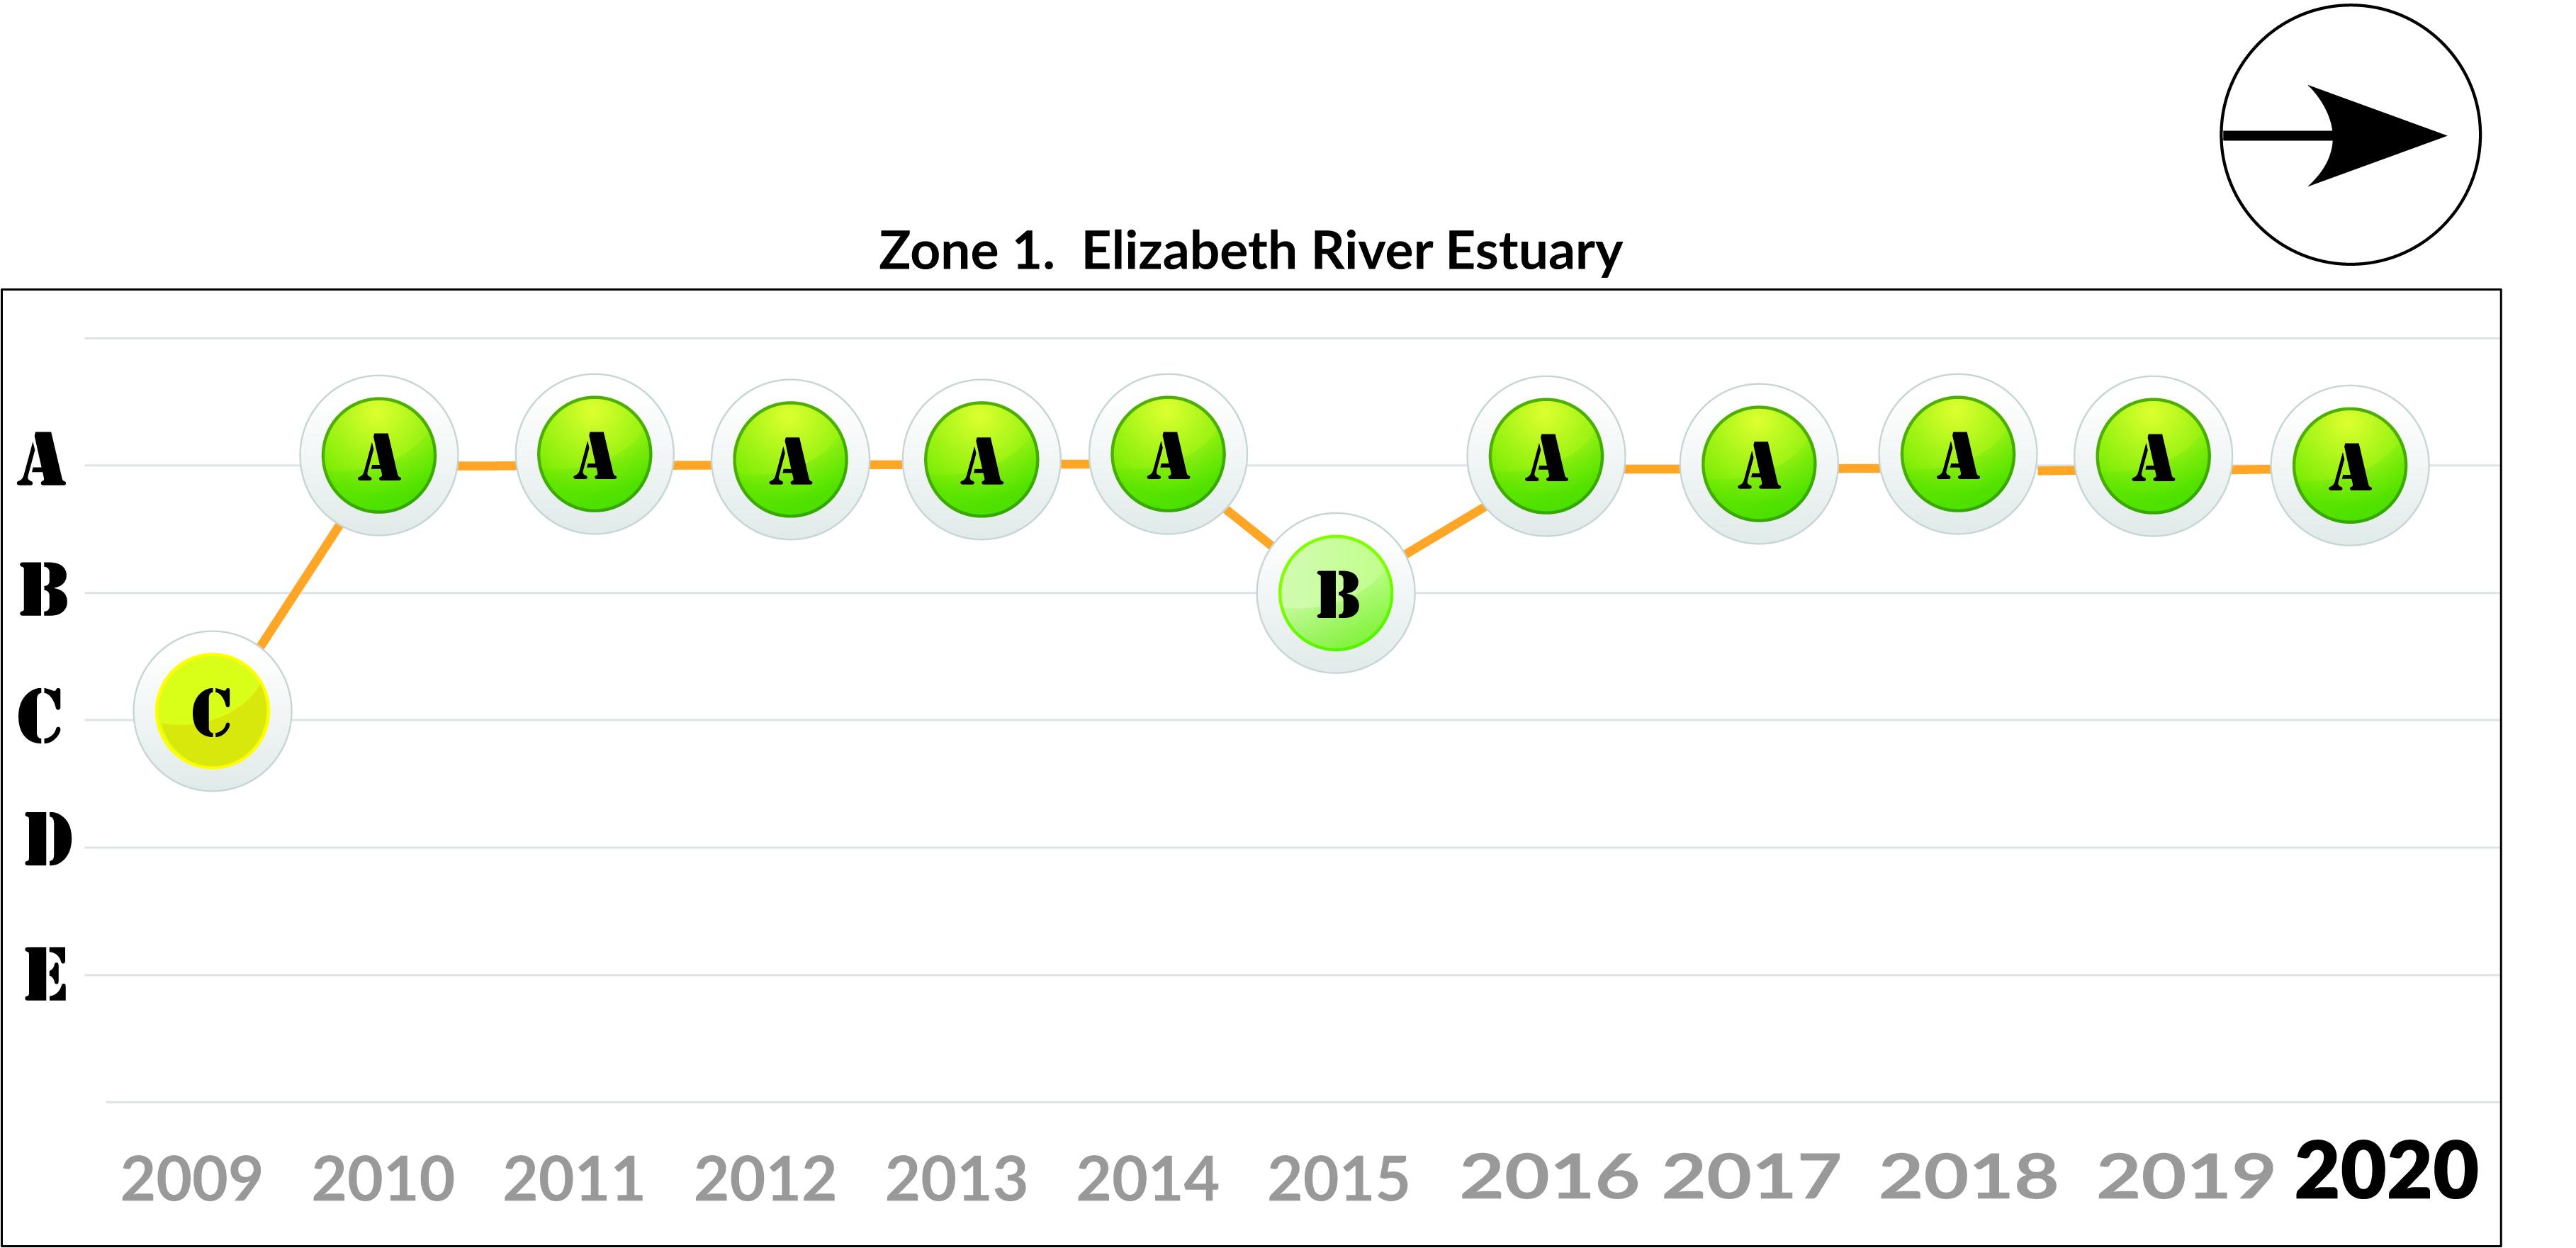 Zone 1 - Elizabeth River Estuary trend 2020